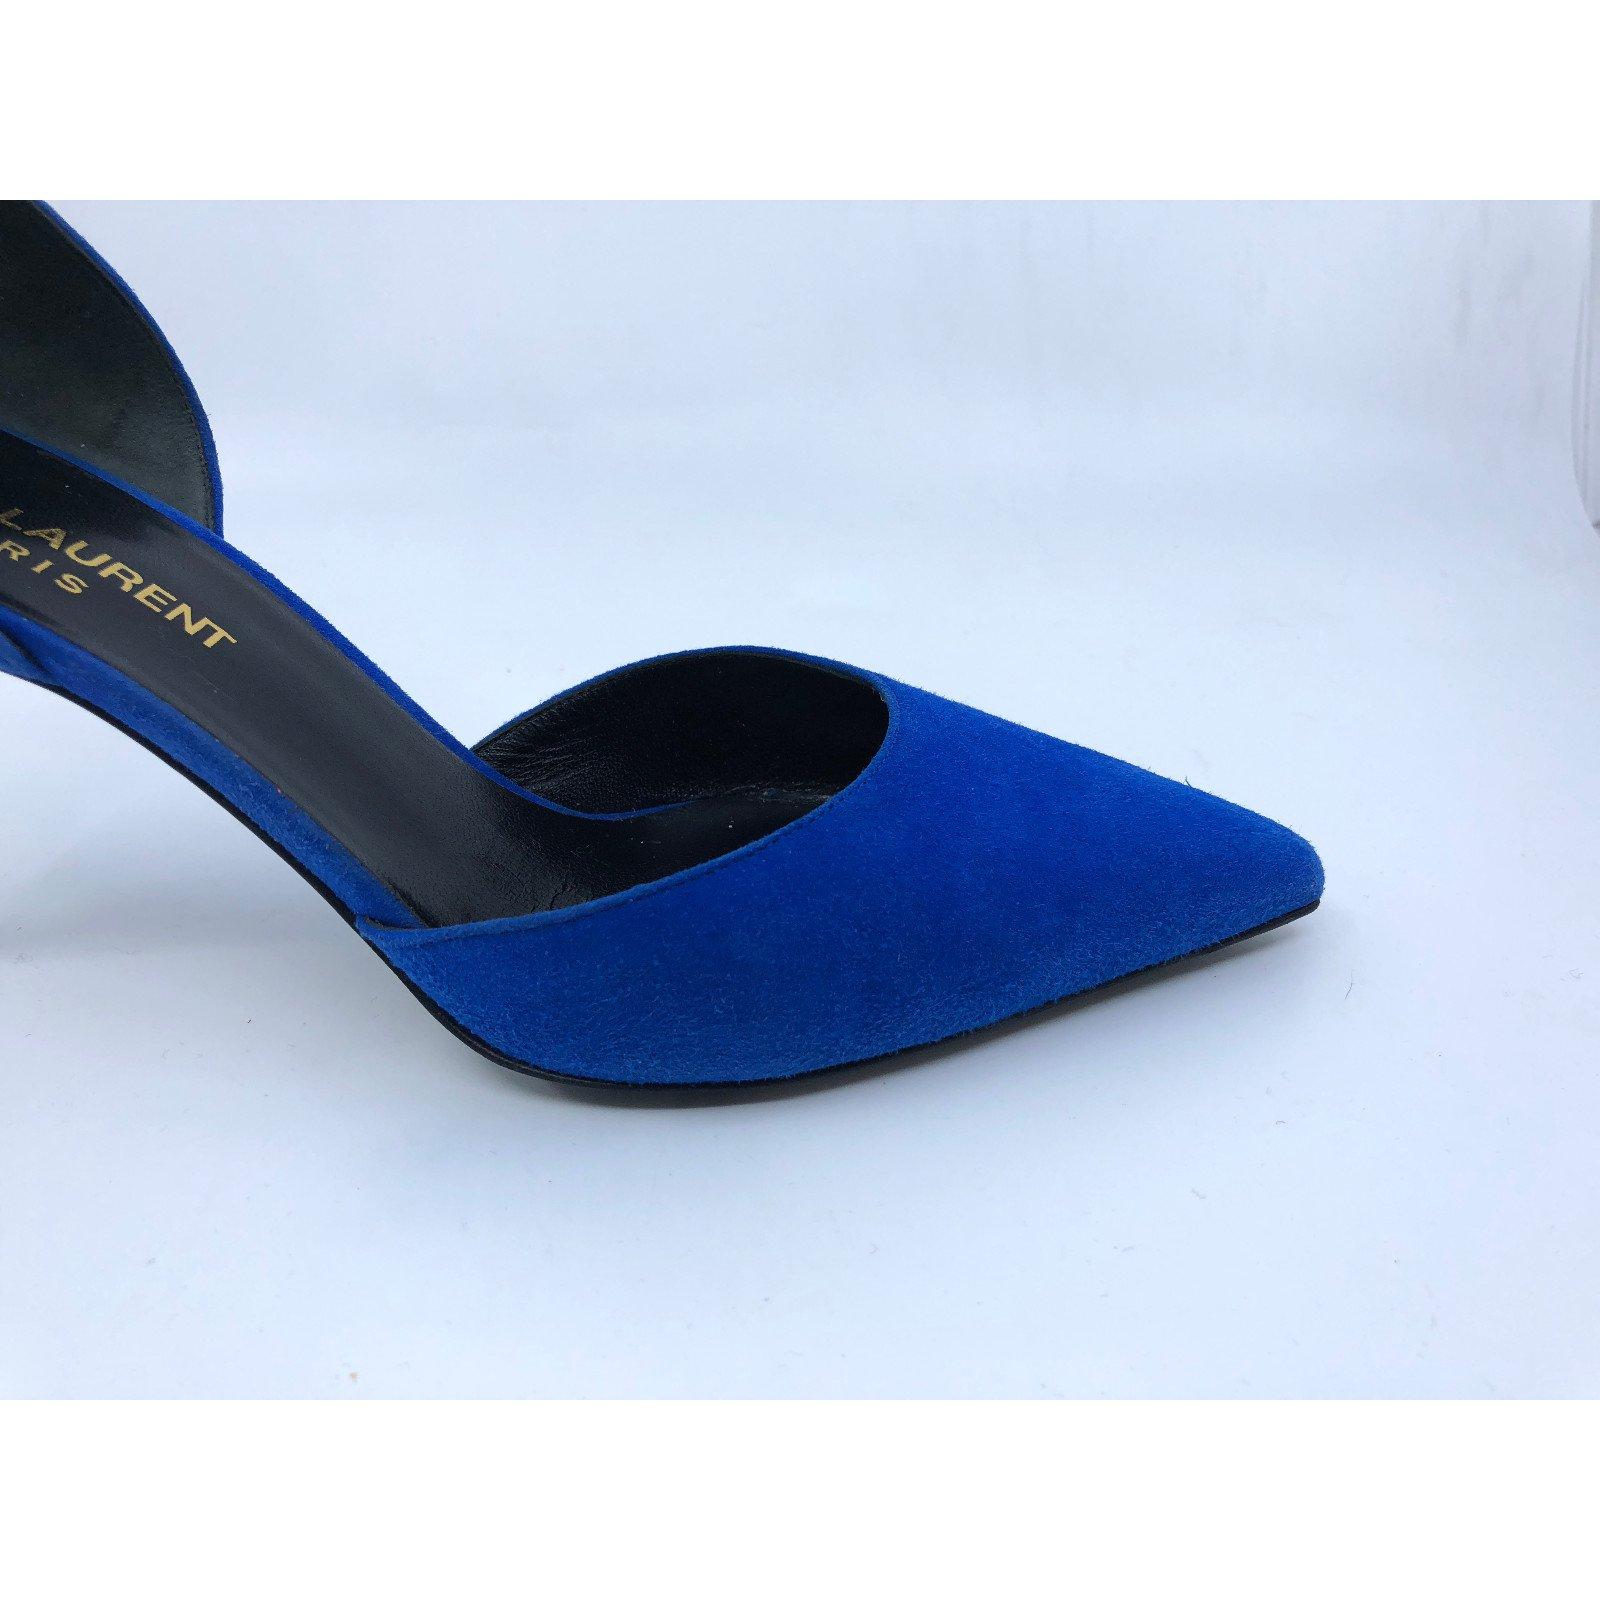 5cc031d9d8d Facebook · Pin This. Yves Saint Laurent Heels Heels Deerskin Blue ref.84974